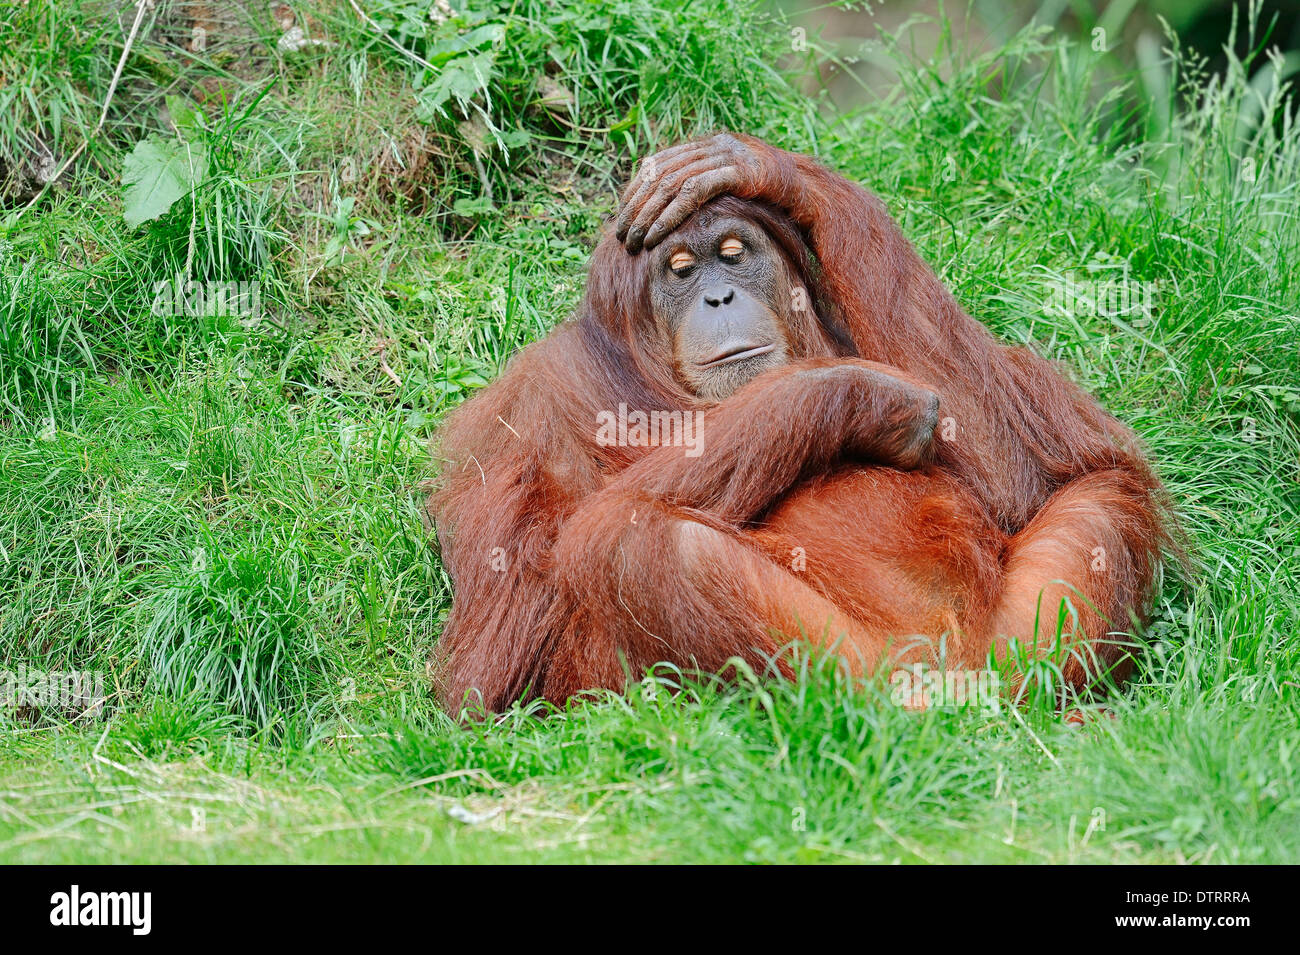 Sumatran Orang-utan / (Pongo pygmaeus abelii, Pongo abelii) / Sumatran Orangutan Stock Photo